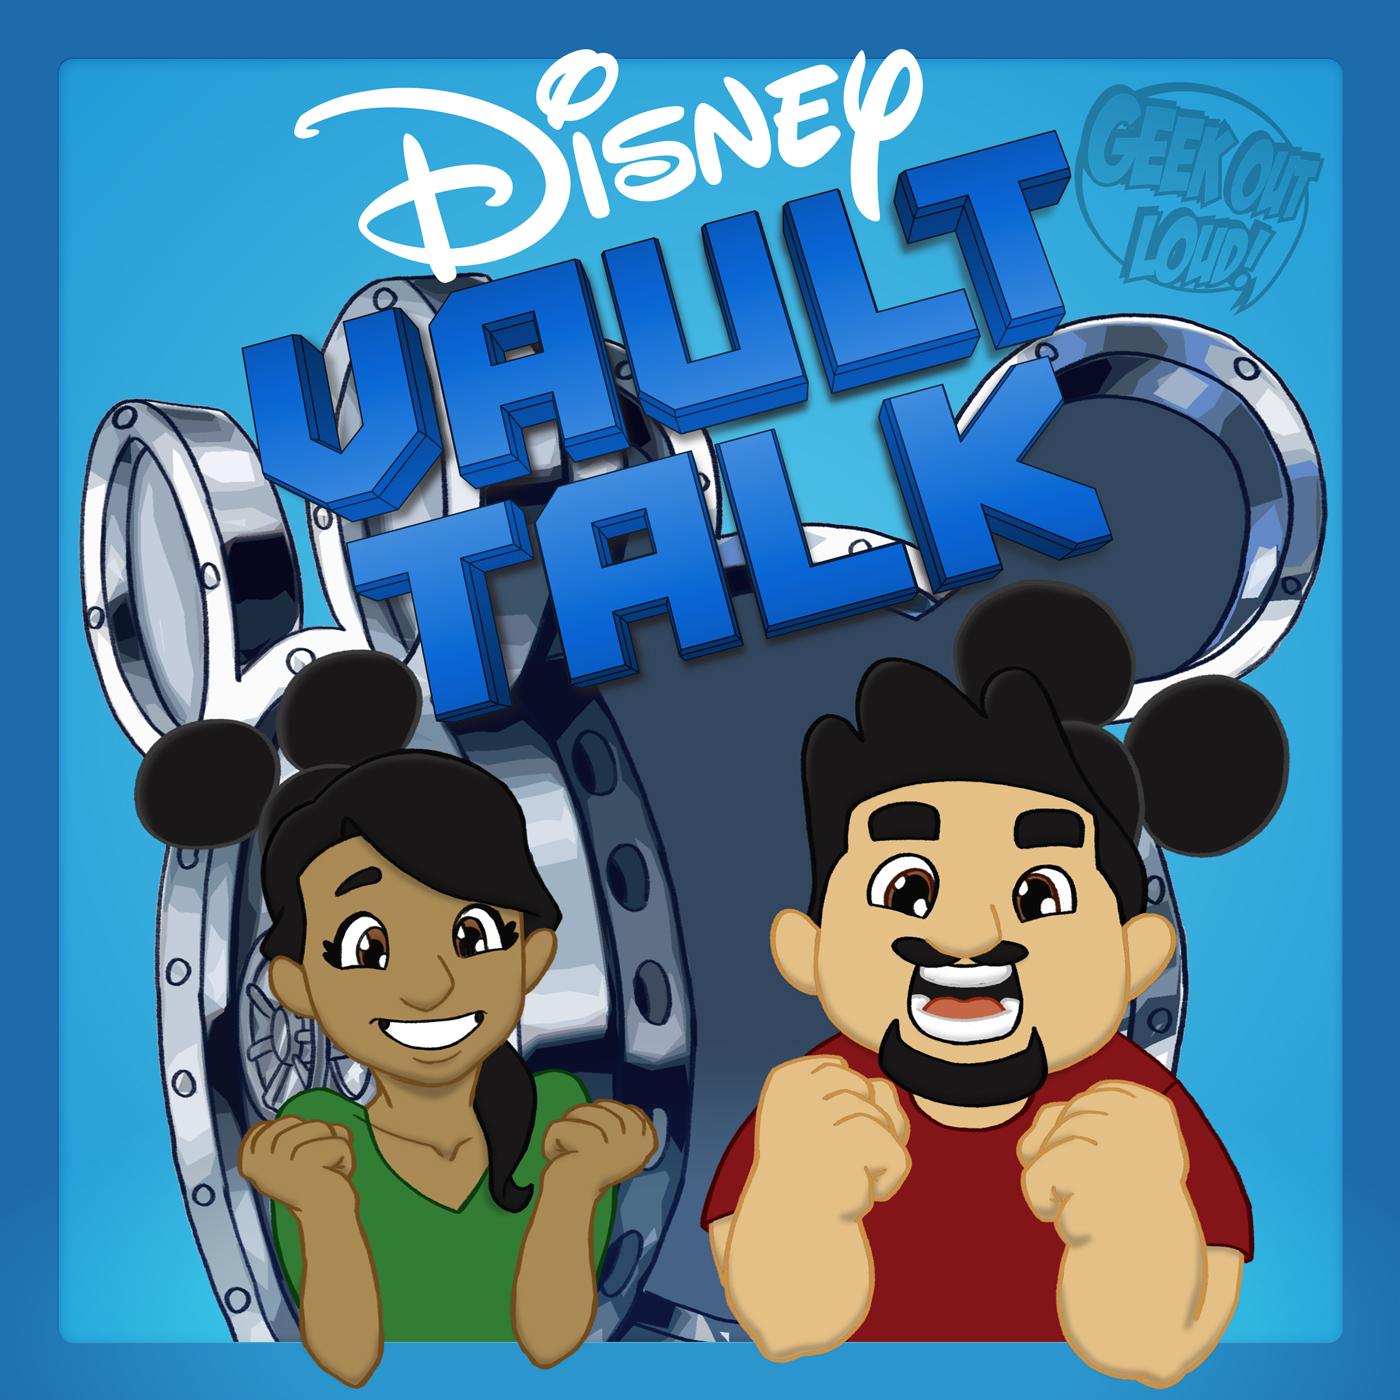 Disney Vault Talk – Geek Out Loud